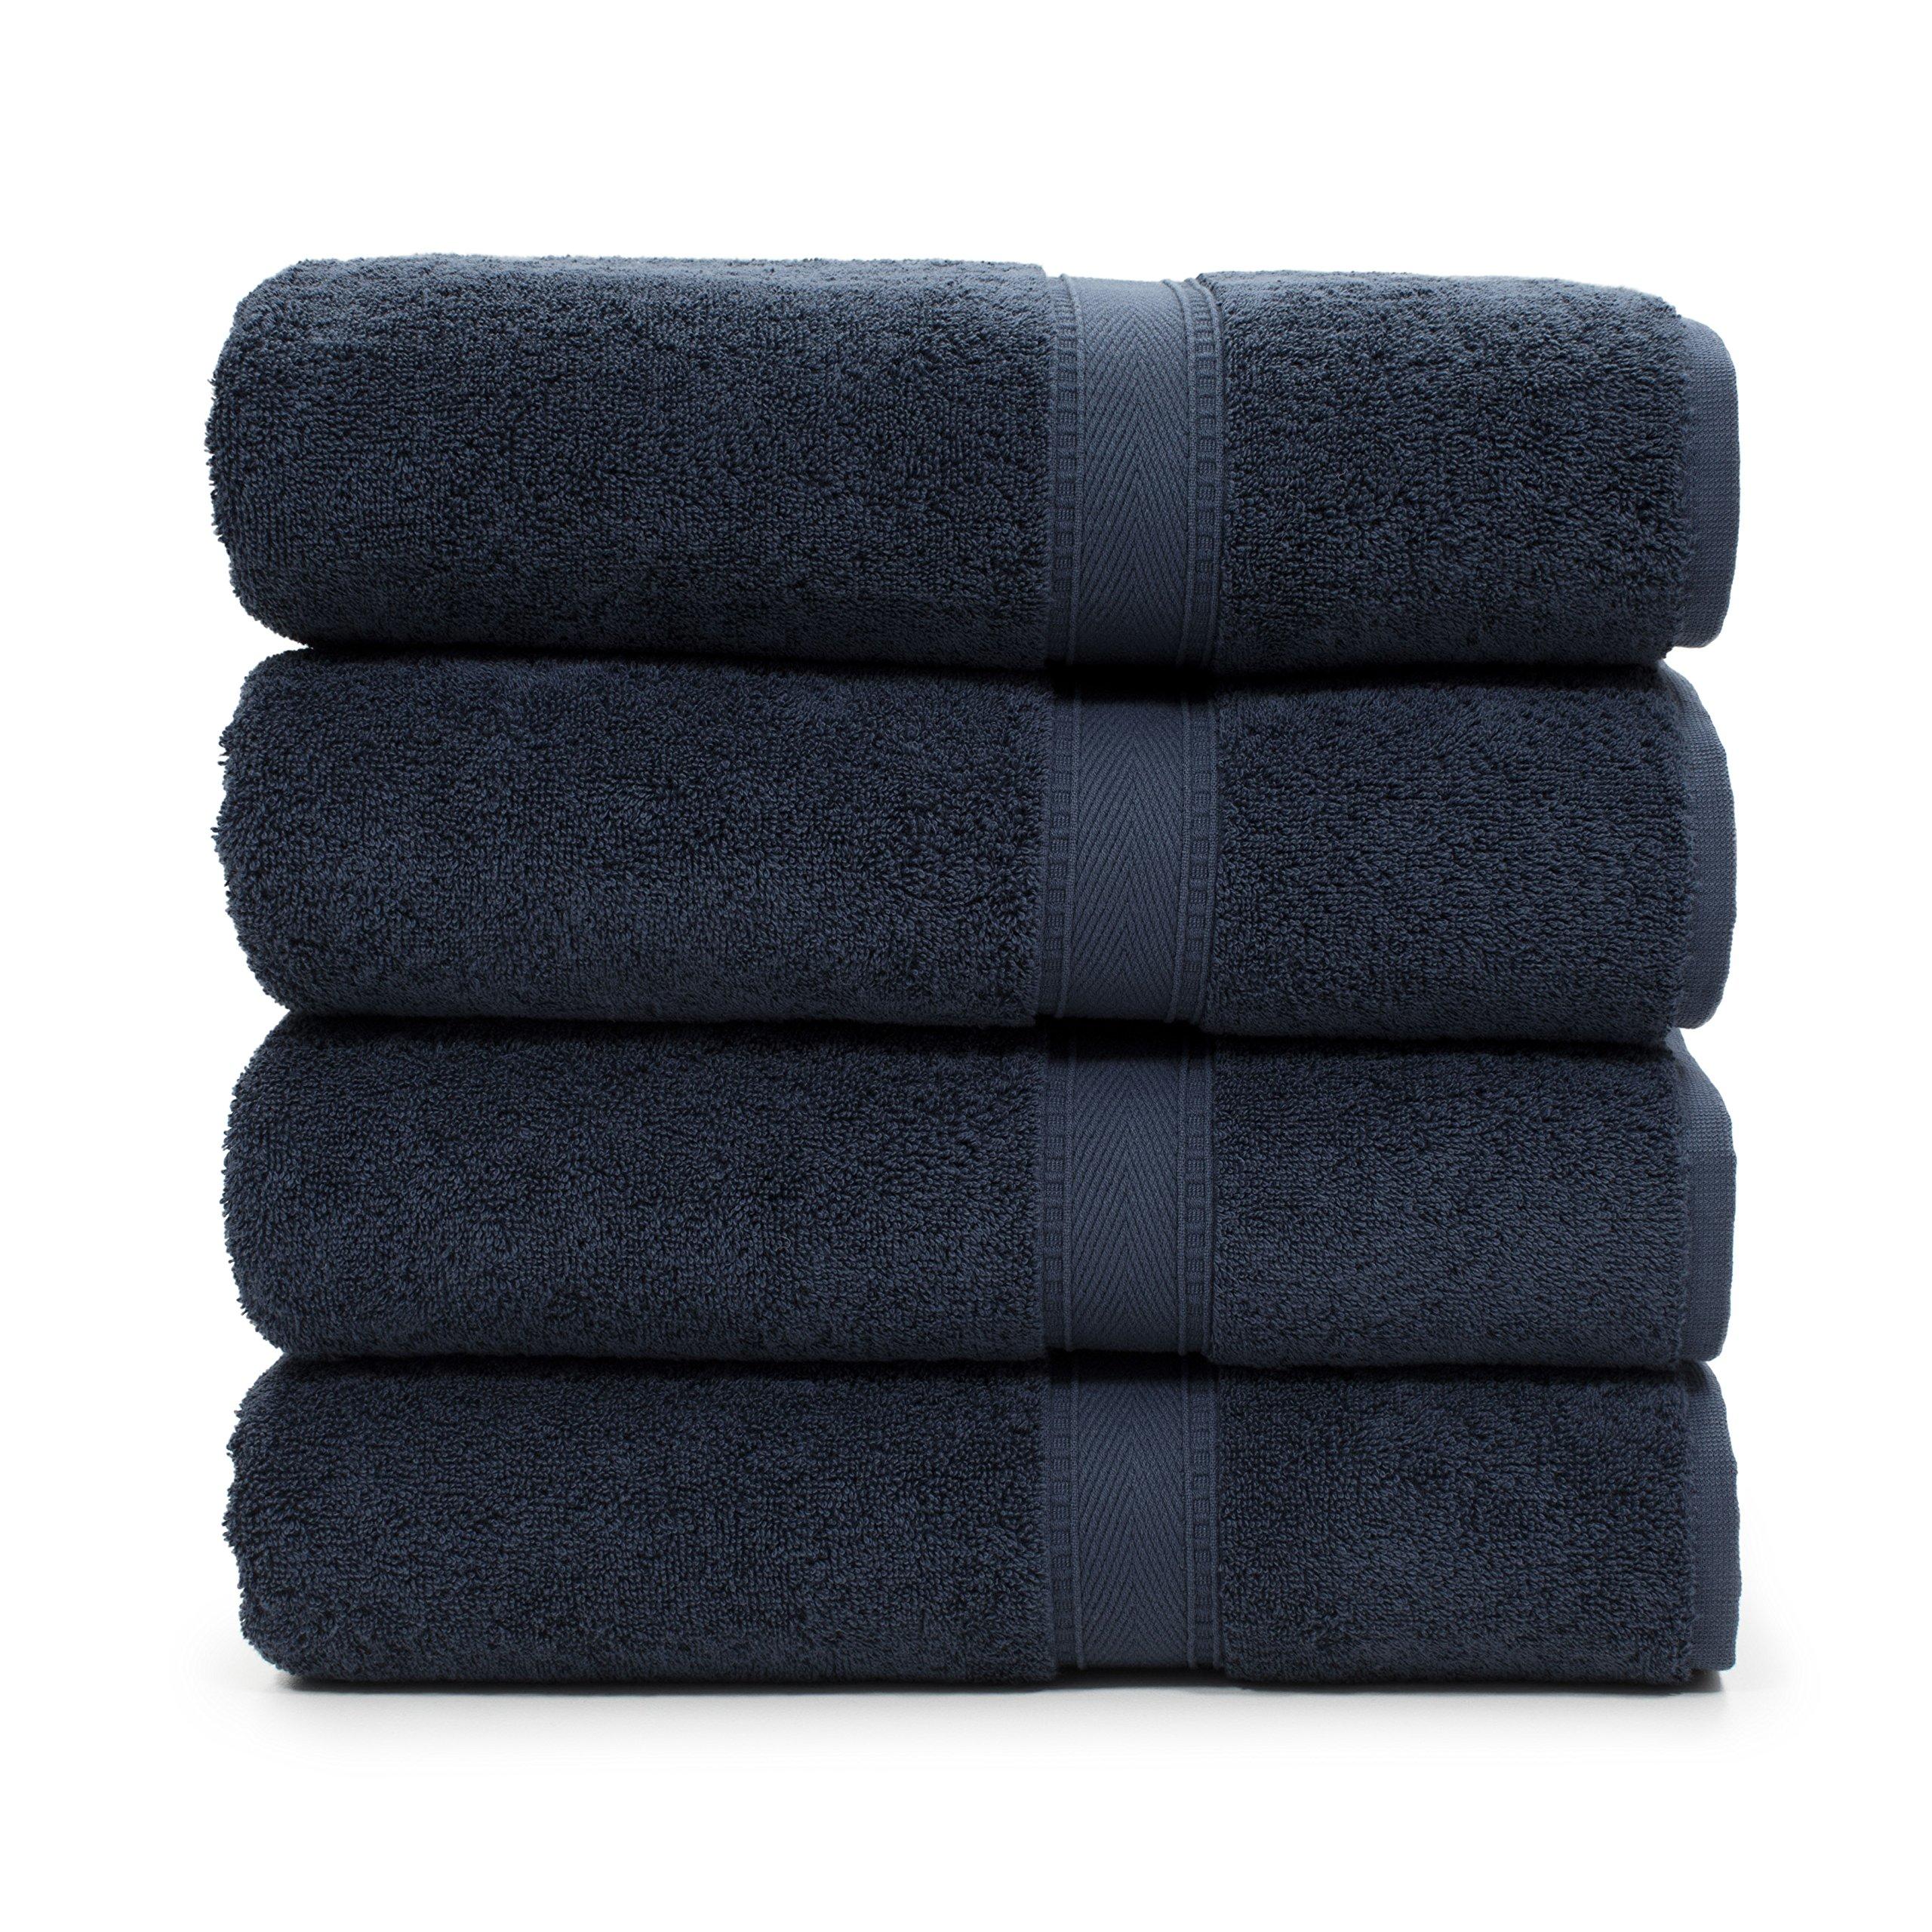 LT Elite Luxury Hotel & Spa Collection Premium Turkish Terry Cotton Bath Towel Set, 4 Bath Towels, Navy